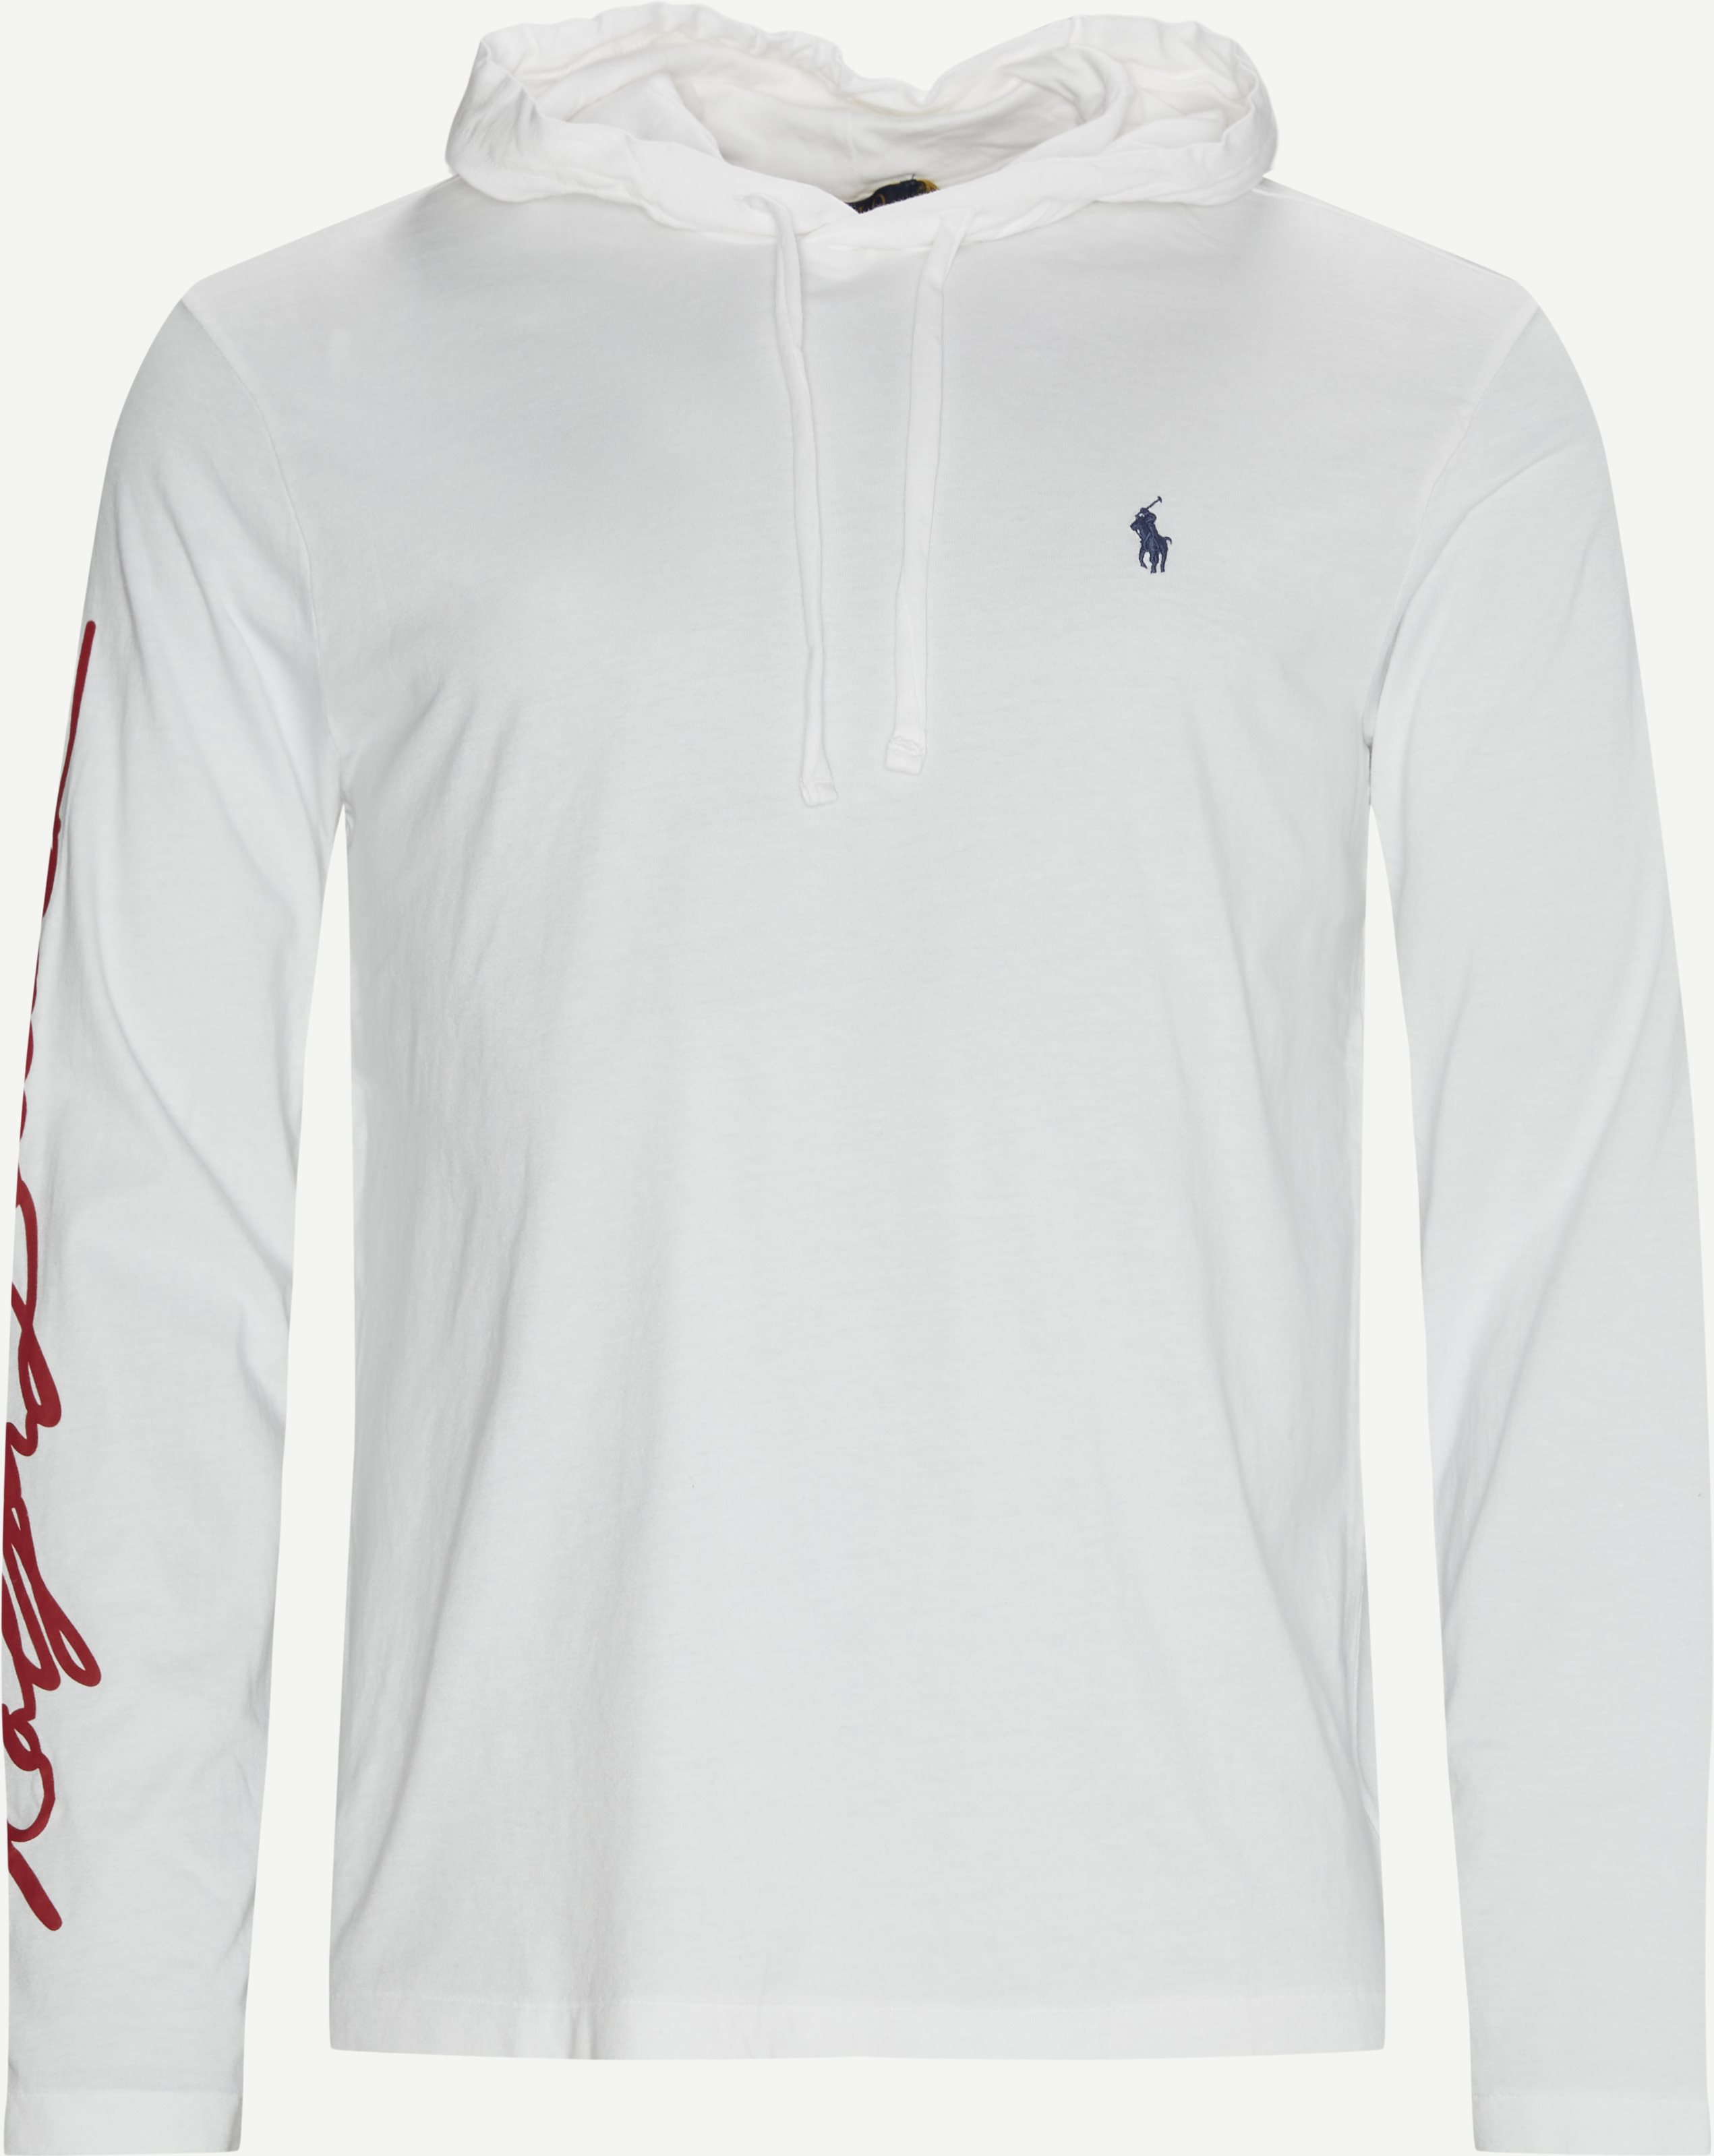 T-Shirts - Regular - Weiß